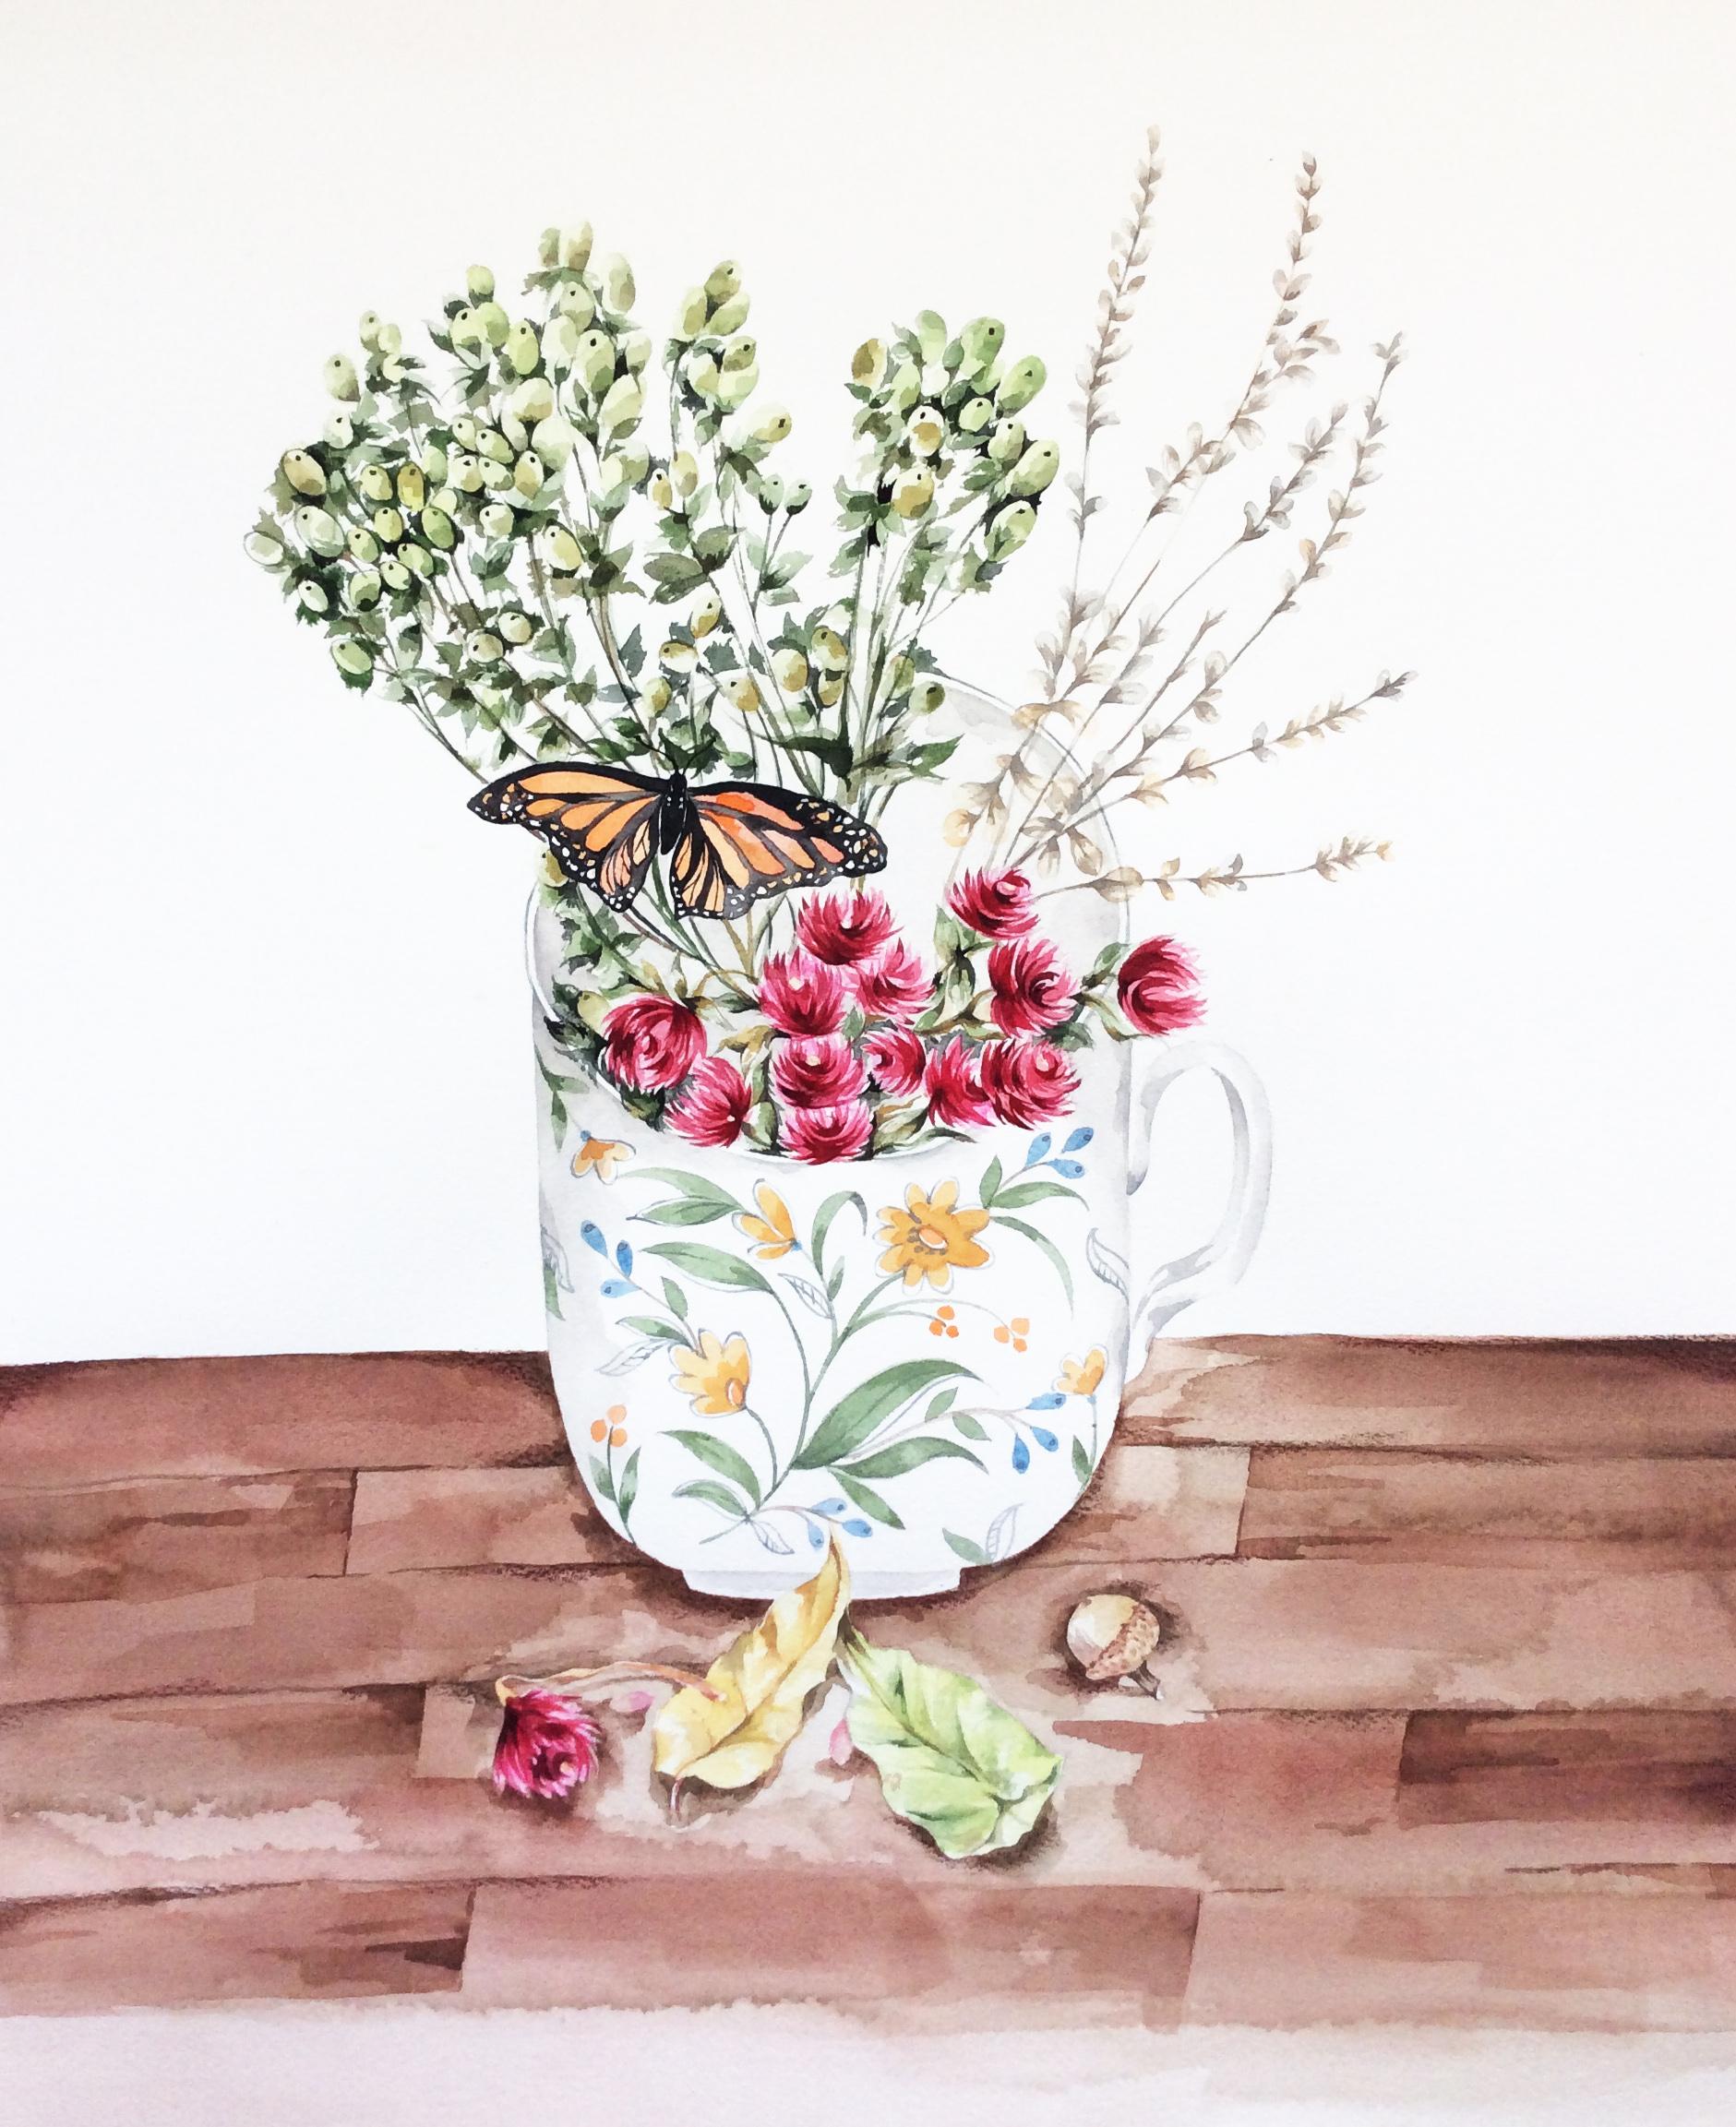 "Butterfly & Dried Flowers 18x15.75"" Watercolor"